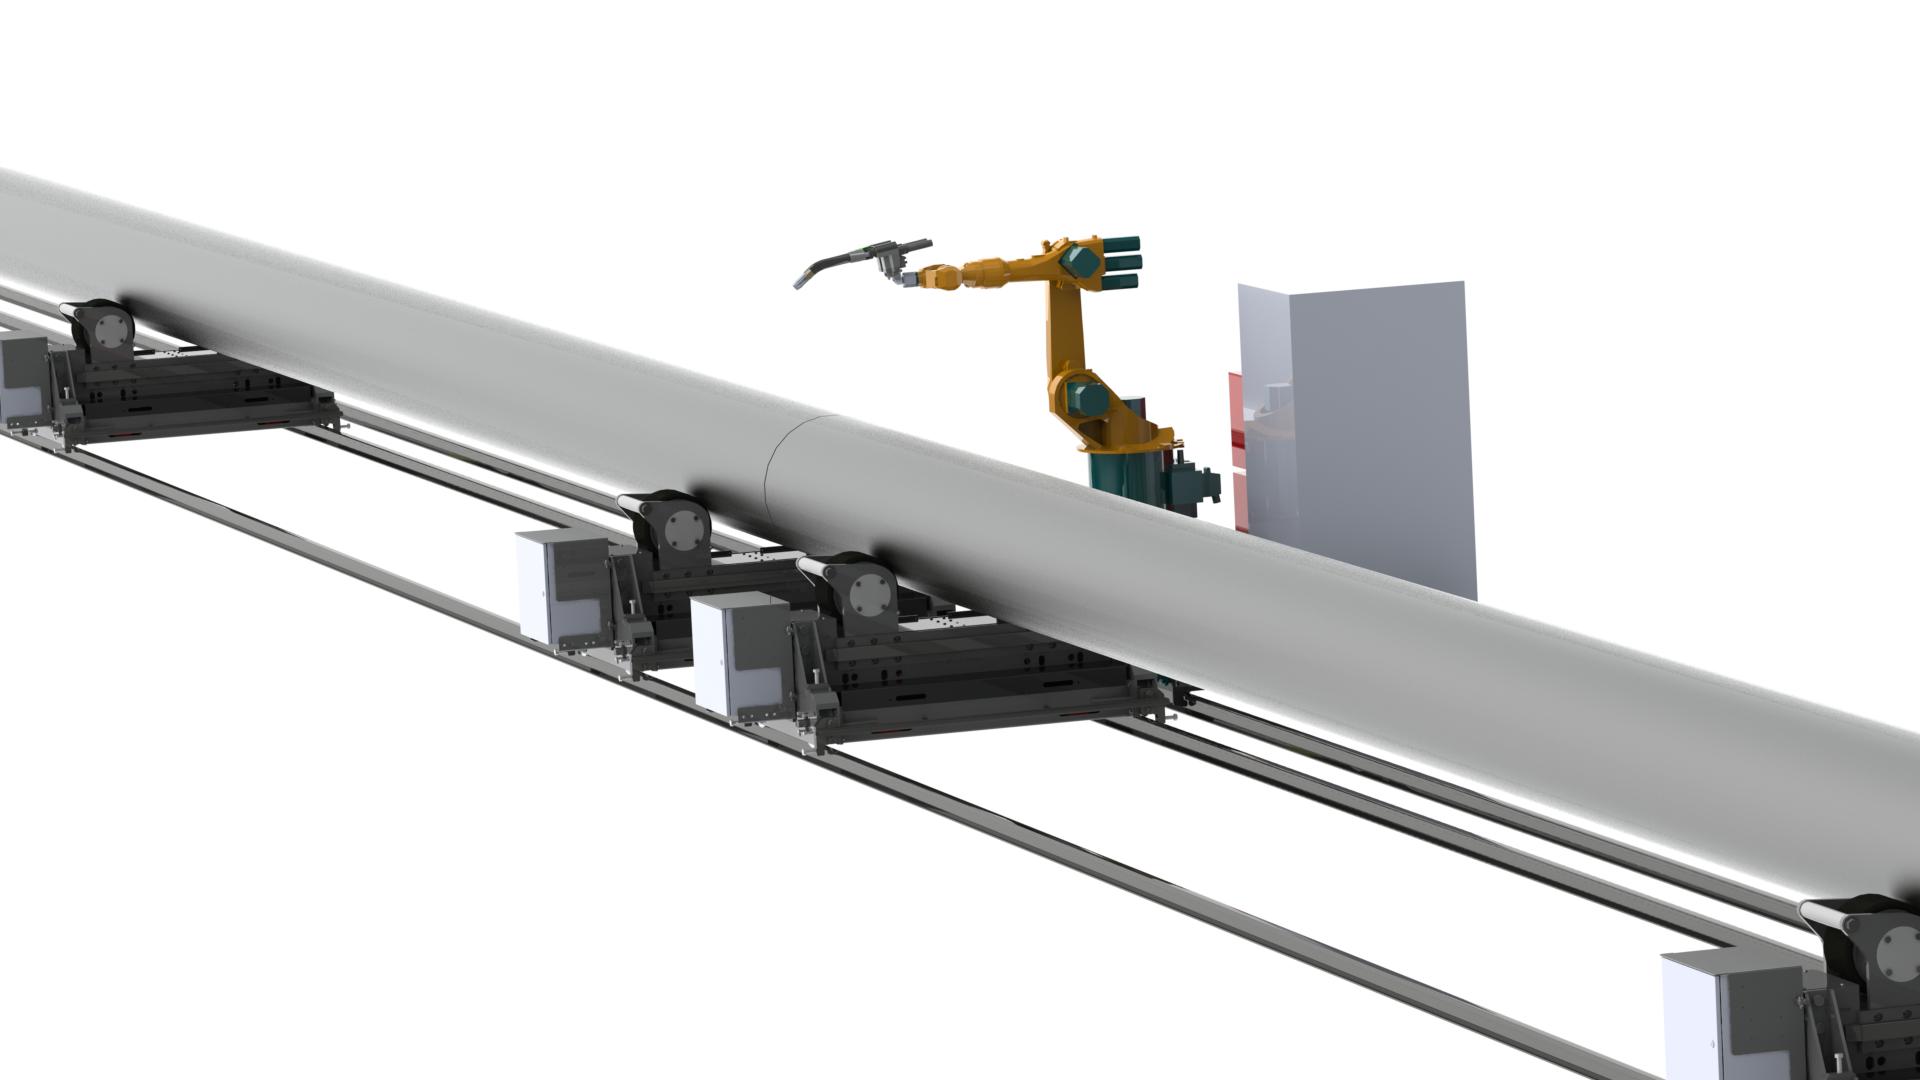 robotic CMT welding system videos